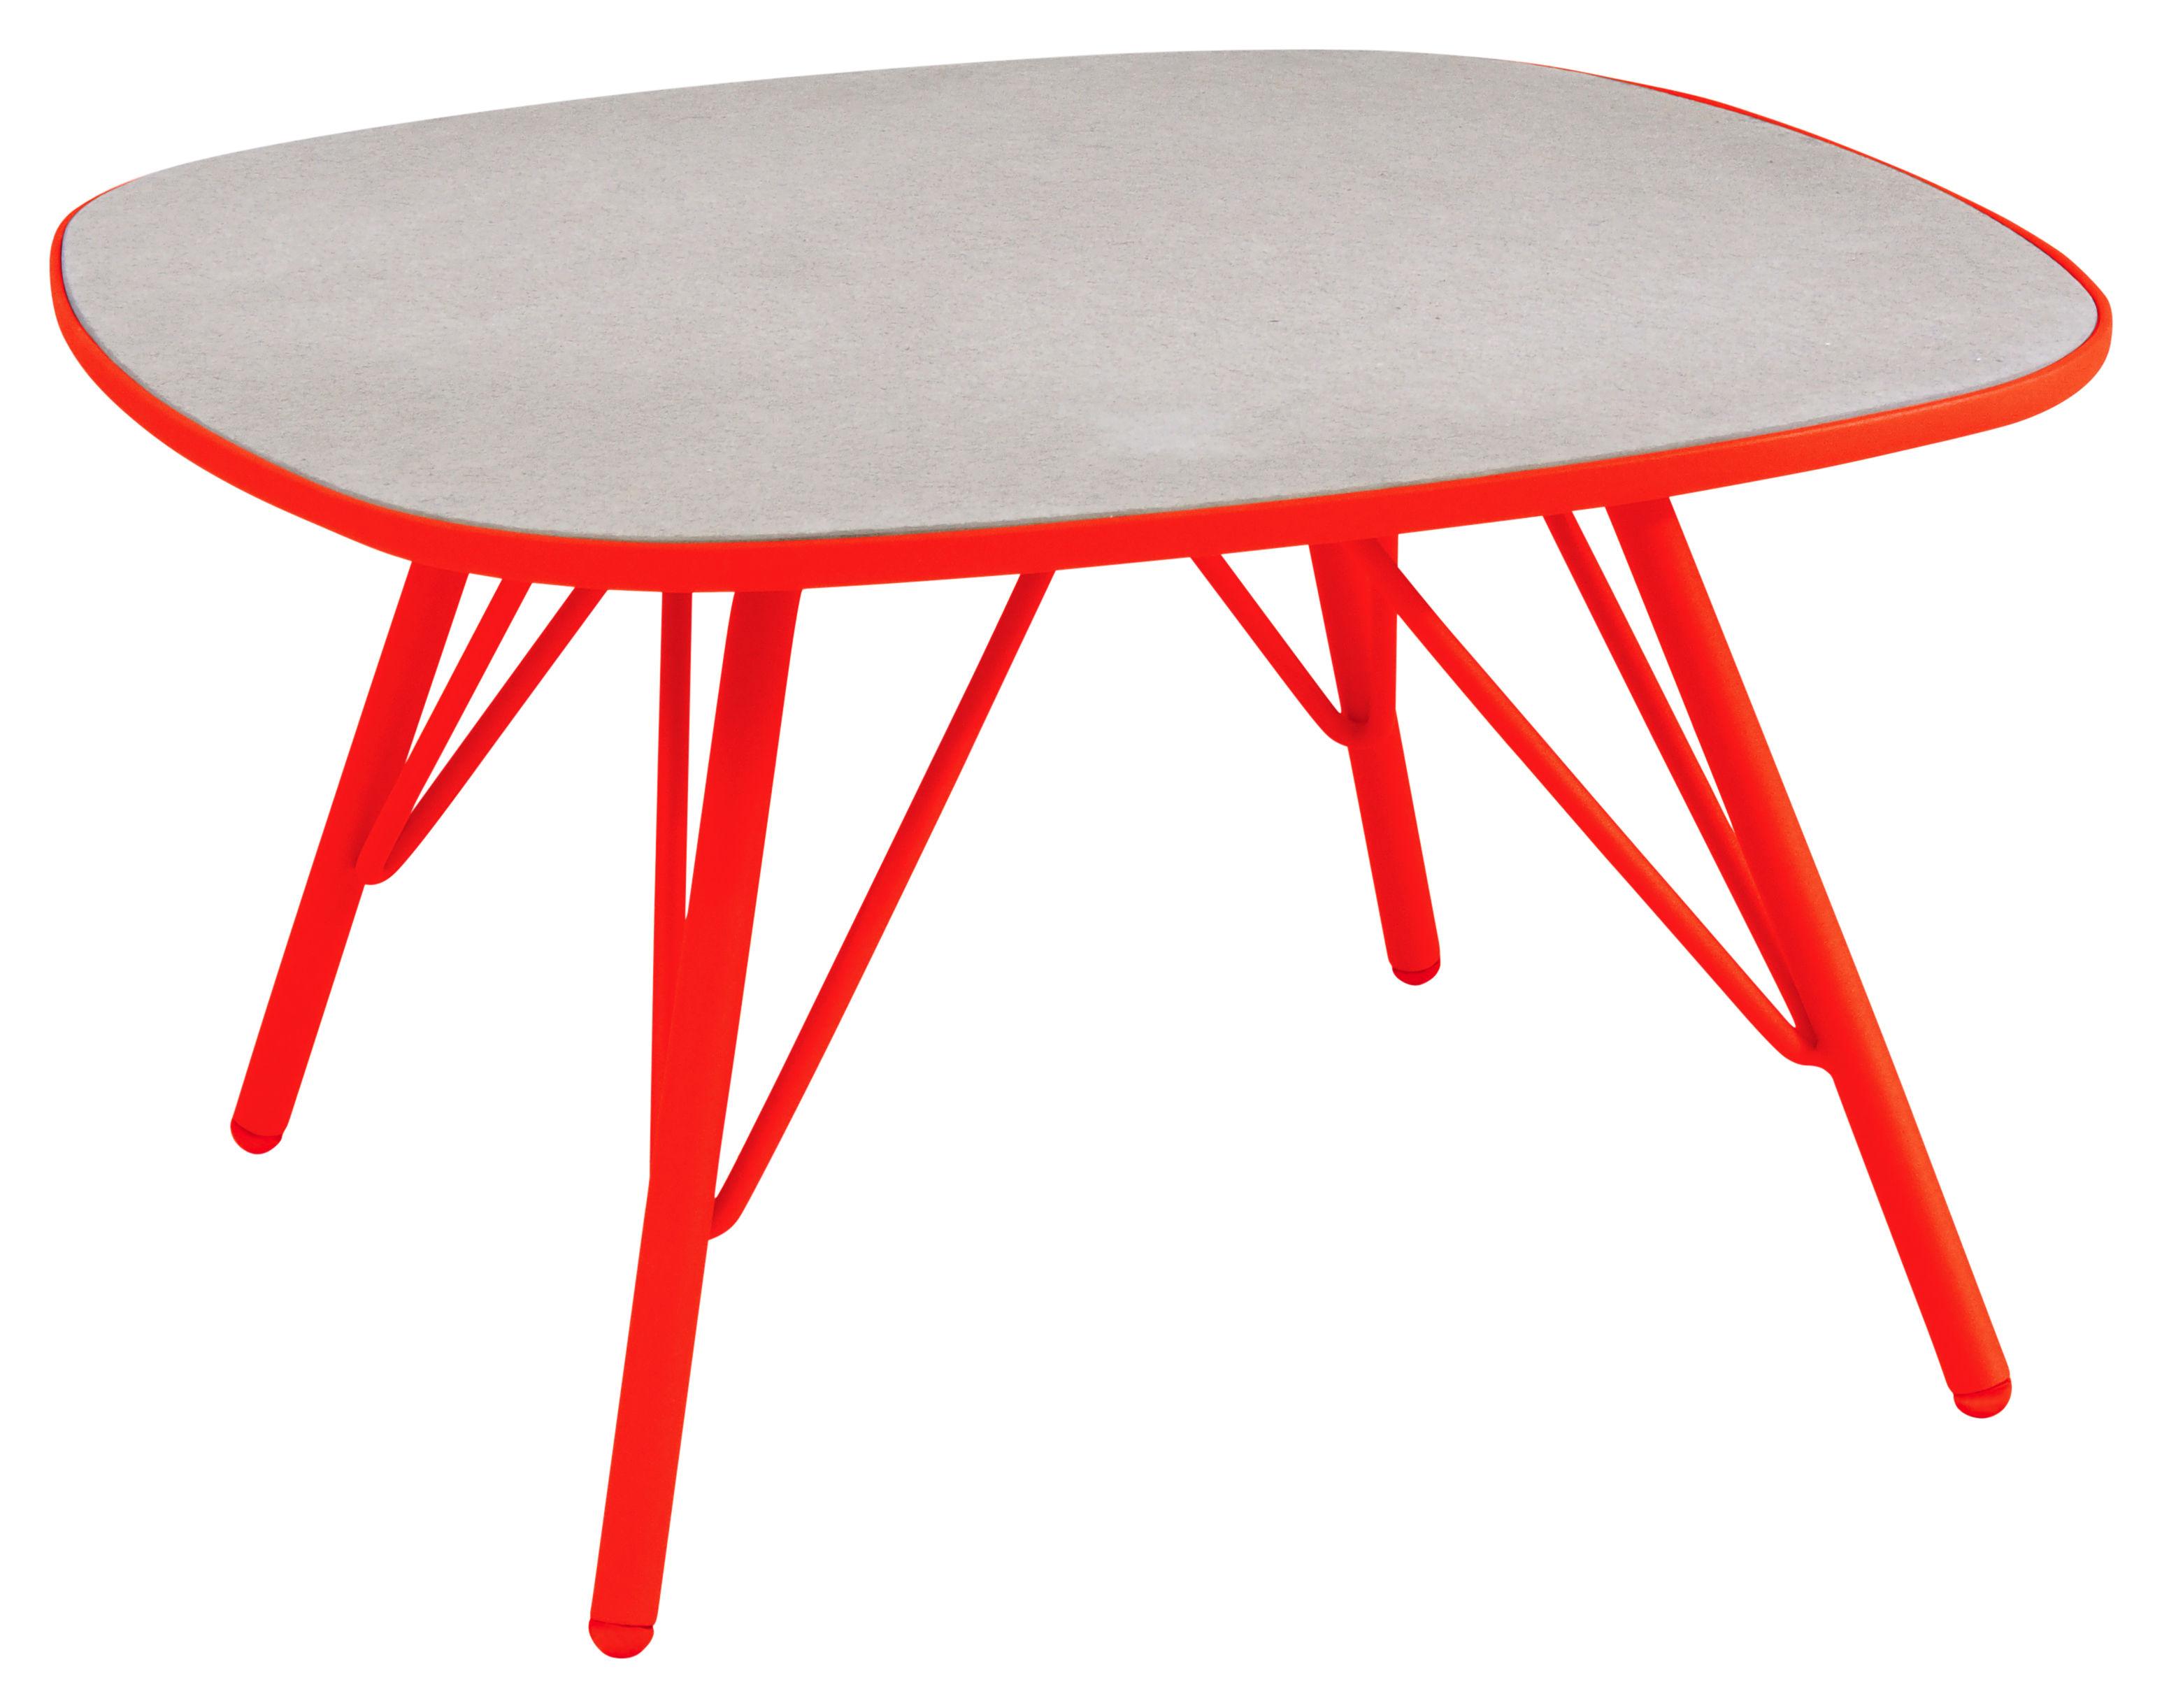 table basse lyze 70 x 70 cm fibre ciment rouge emu. Black Bedroom Furniture Sets. Home Design Ideas